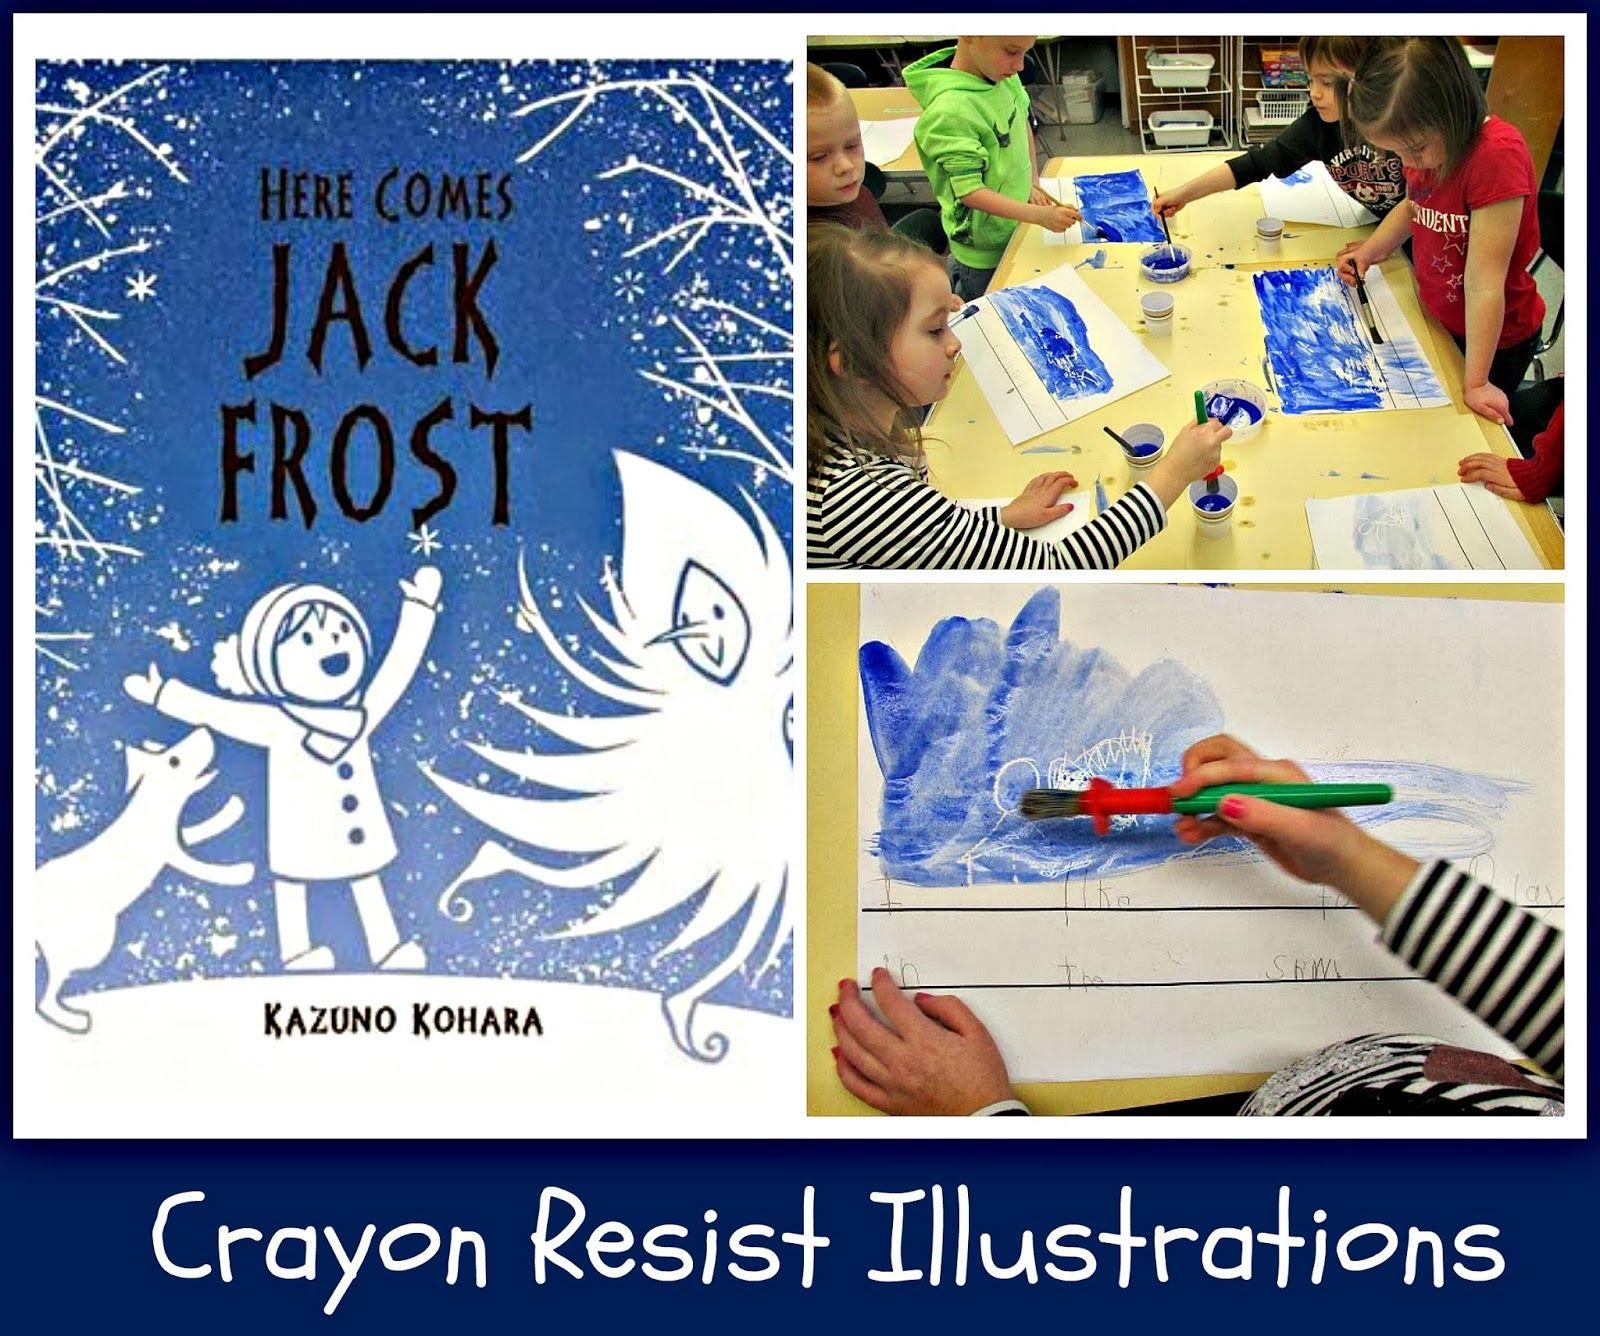 Jack Frost Art Crayon Resist